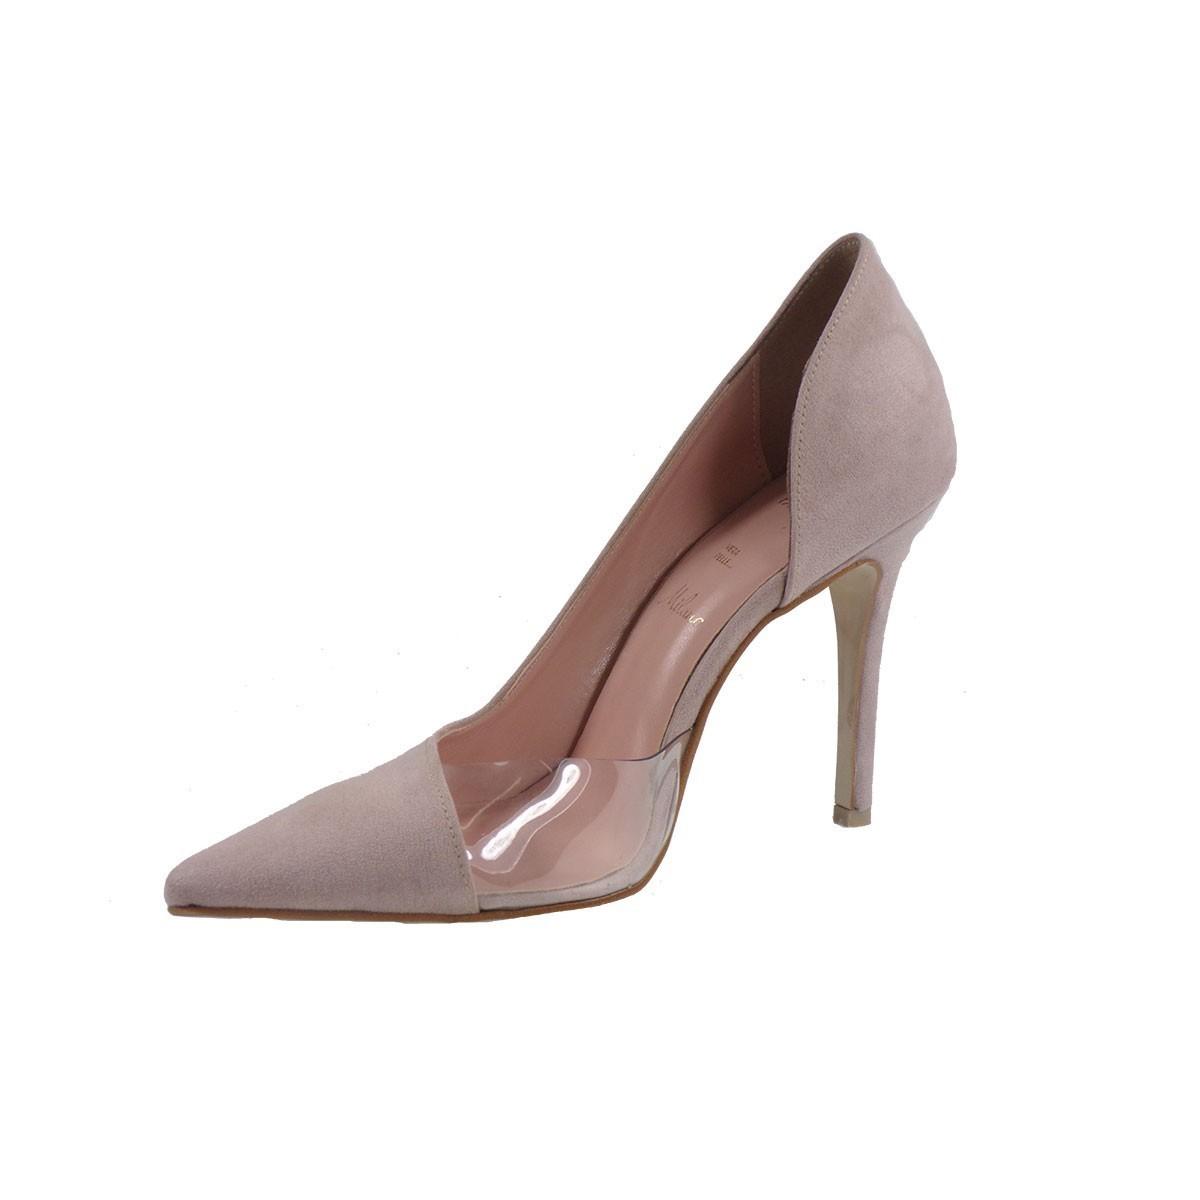 Alessandra Paggioti Γυναικεία Παπούτσια Γόβες 89420 Νude Καστόρι